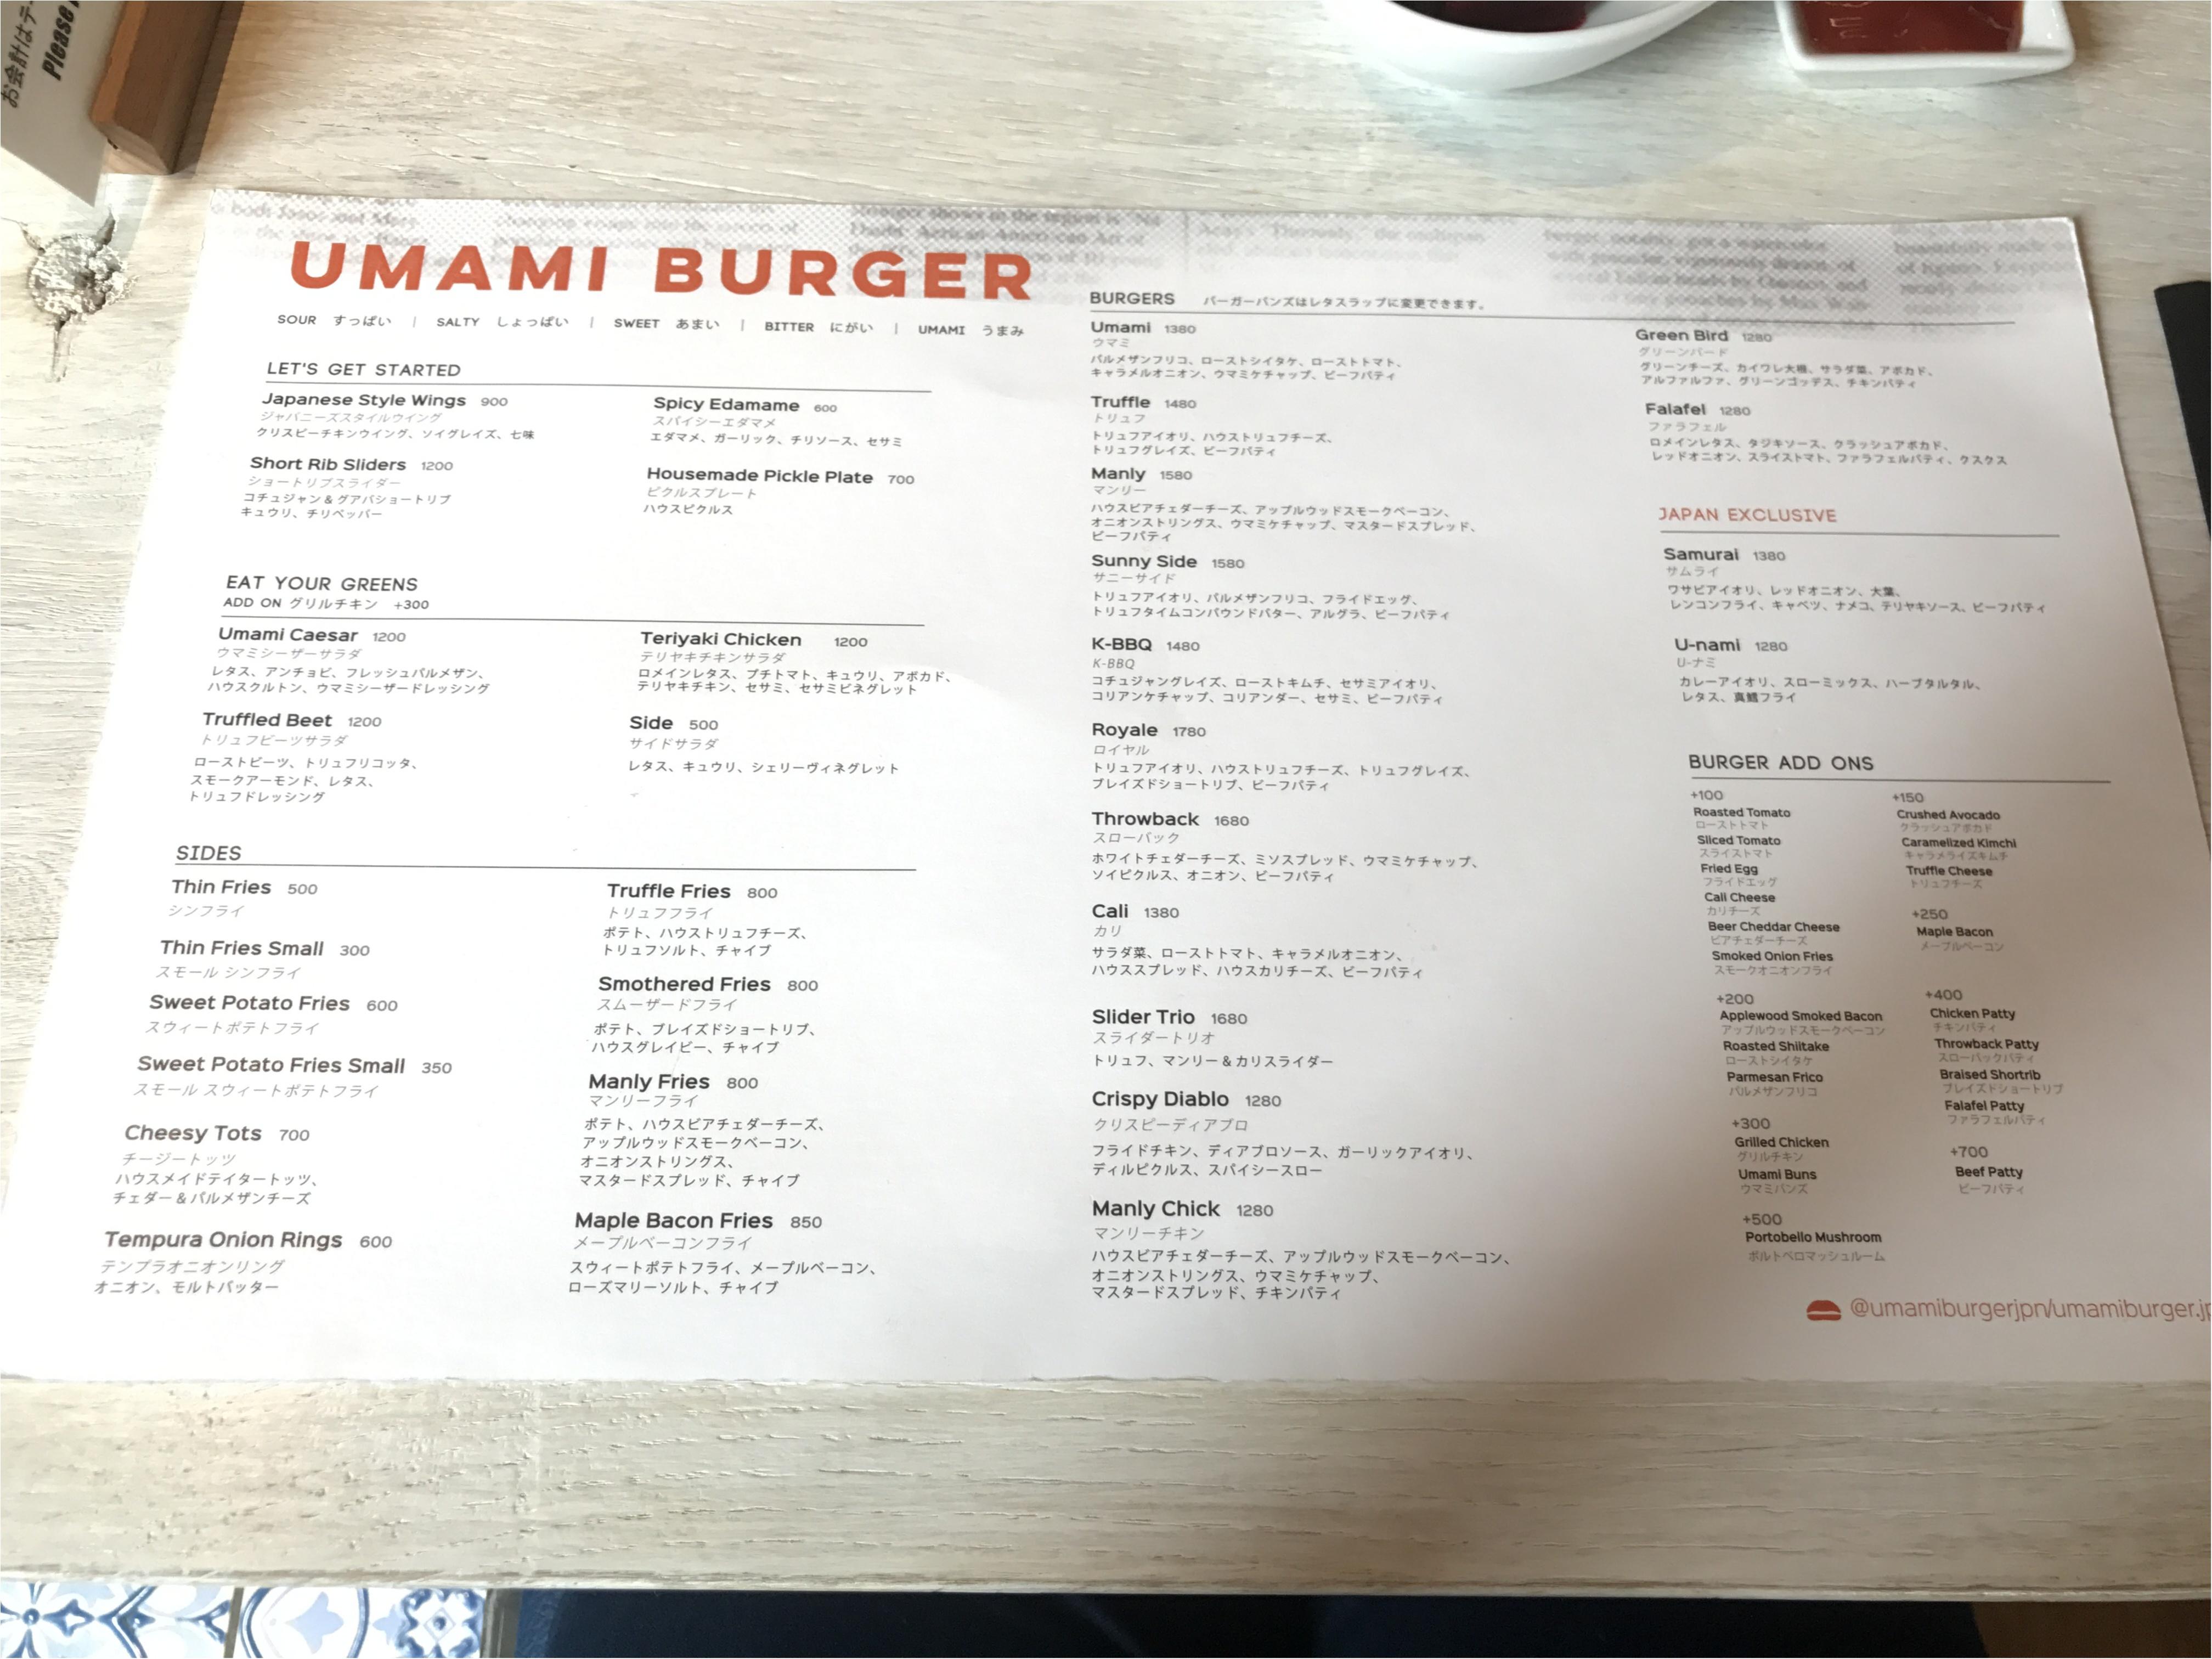 LA発・日本初上陸の人気ハンバーガーレストラン【UMAMI BURGER(ウマミバーガー)】で旨味がつまった絶品バーガーを堪能♡_2